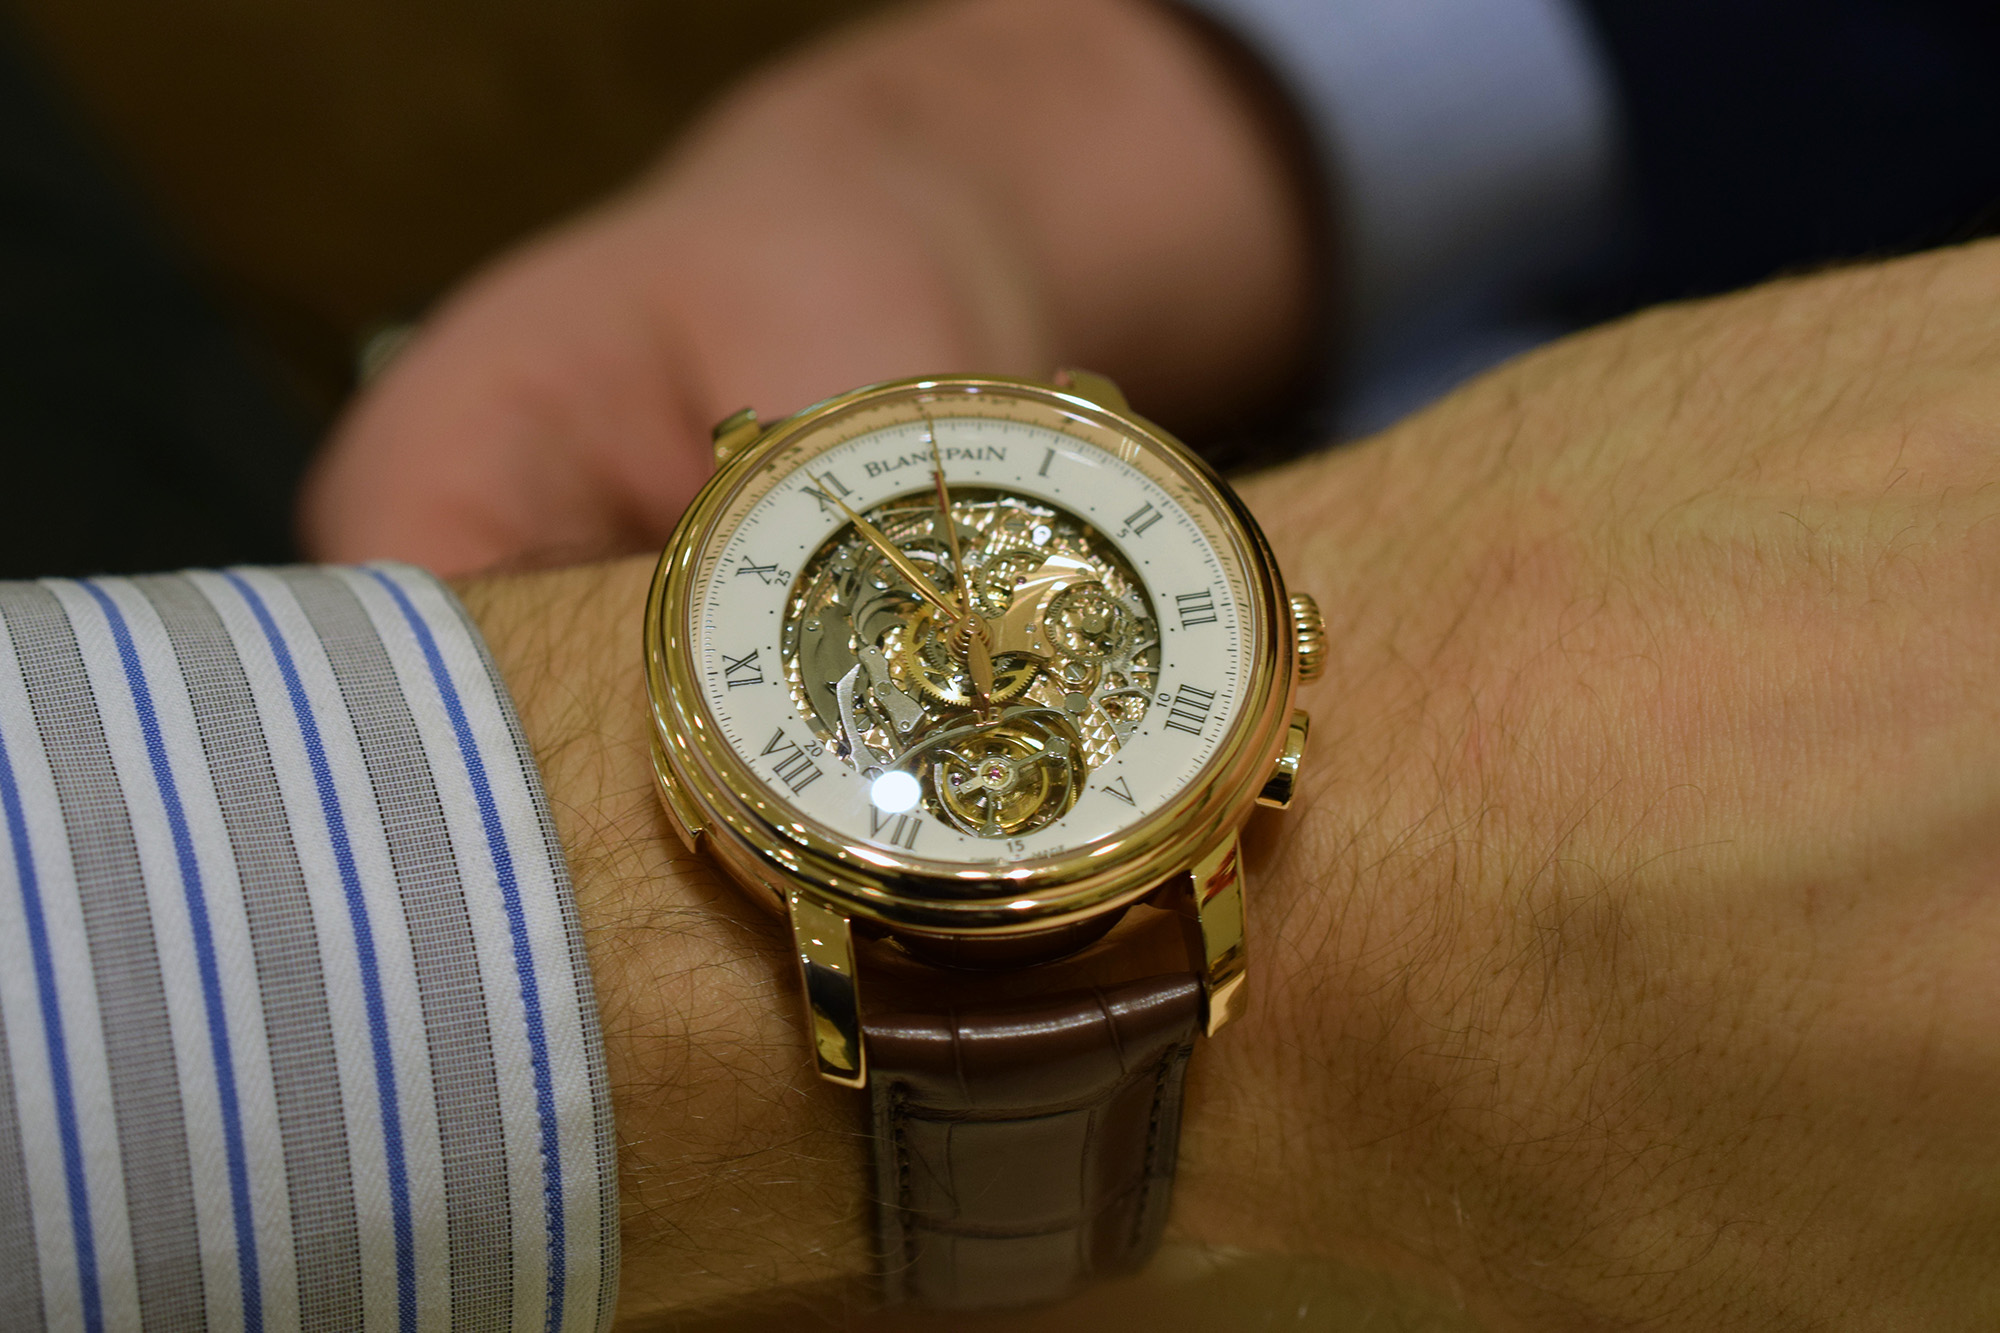 Blancpain Carrousel Répétition Minutes Chronographe Flyback - Wristshot